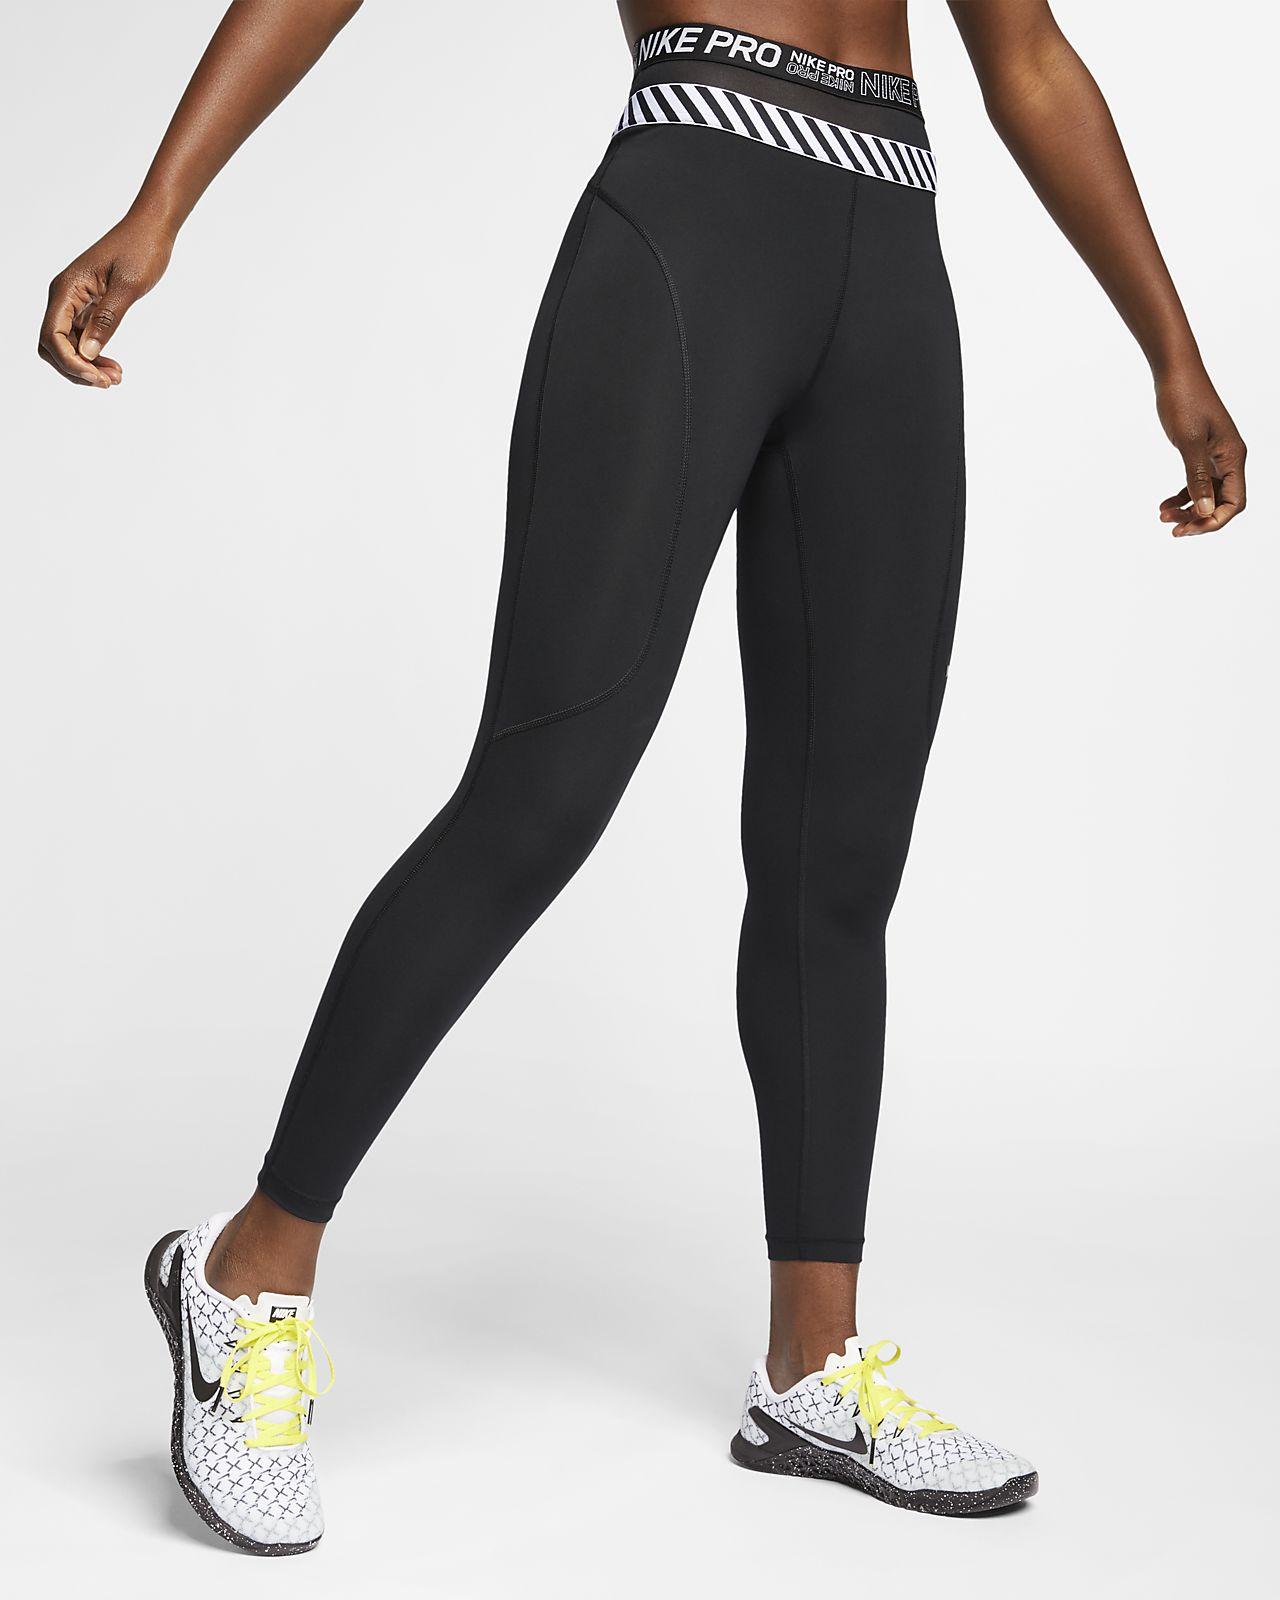 b91735d72985 Γυναικείο κολάν με μήκος 7 8 Nike Pro HyperCool. Nike.com GR